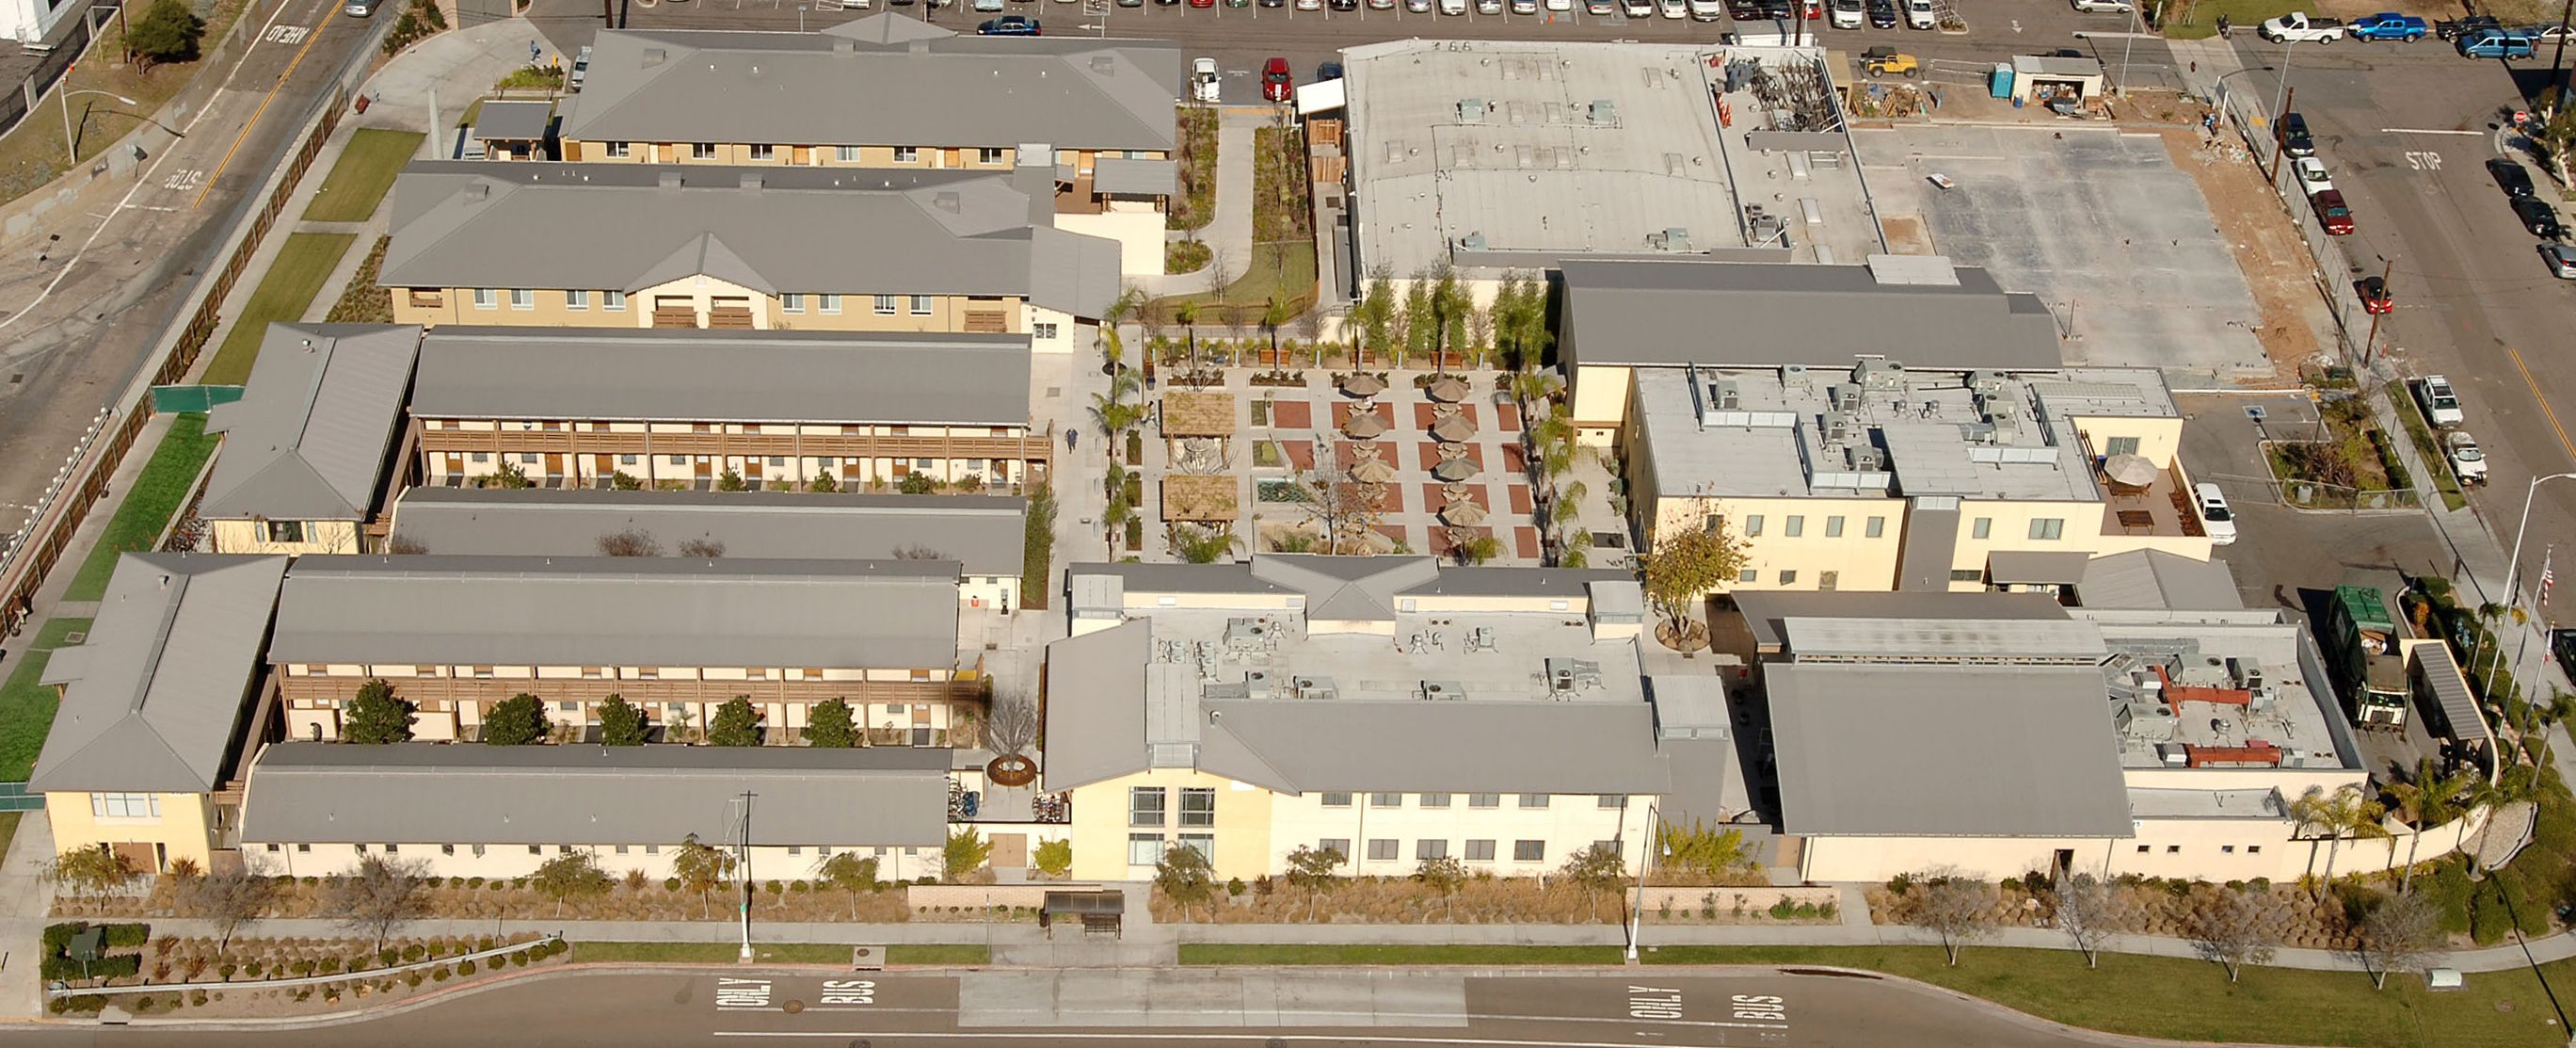 Housing Veterans Village Veteran Housing Housing Options